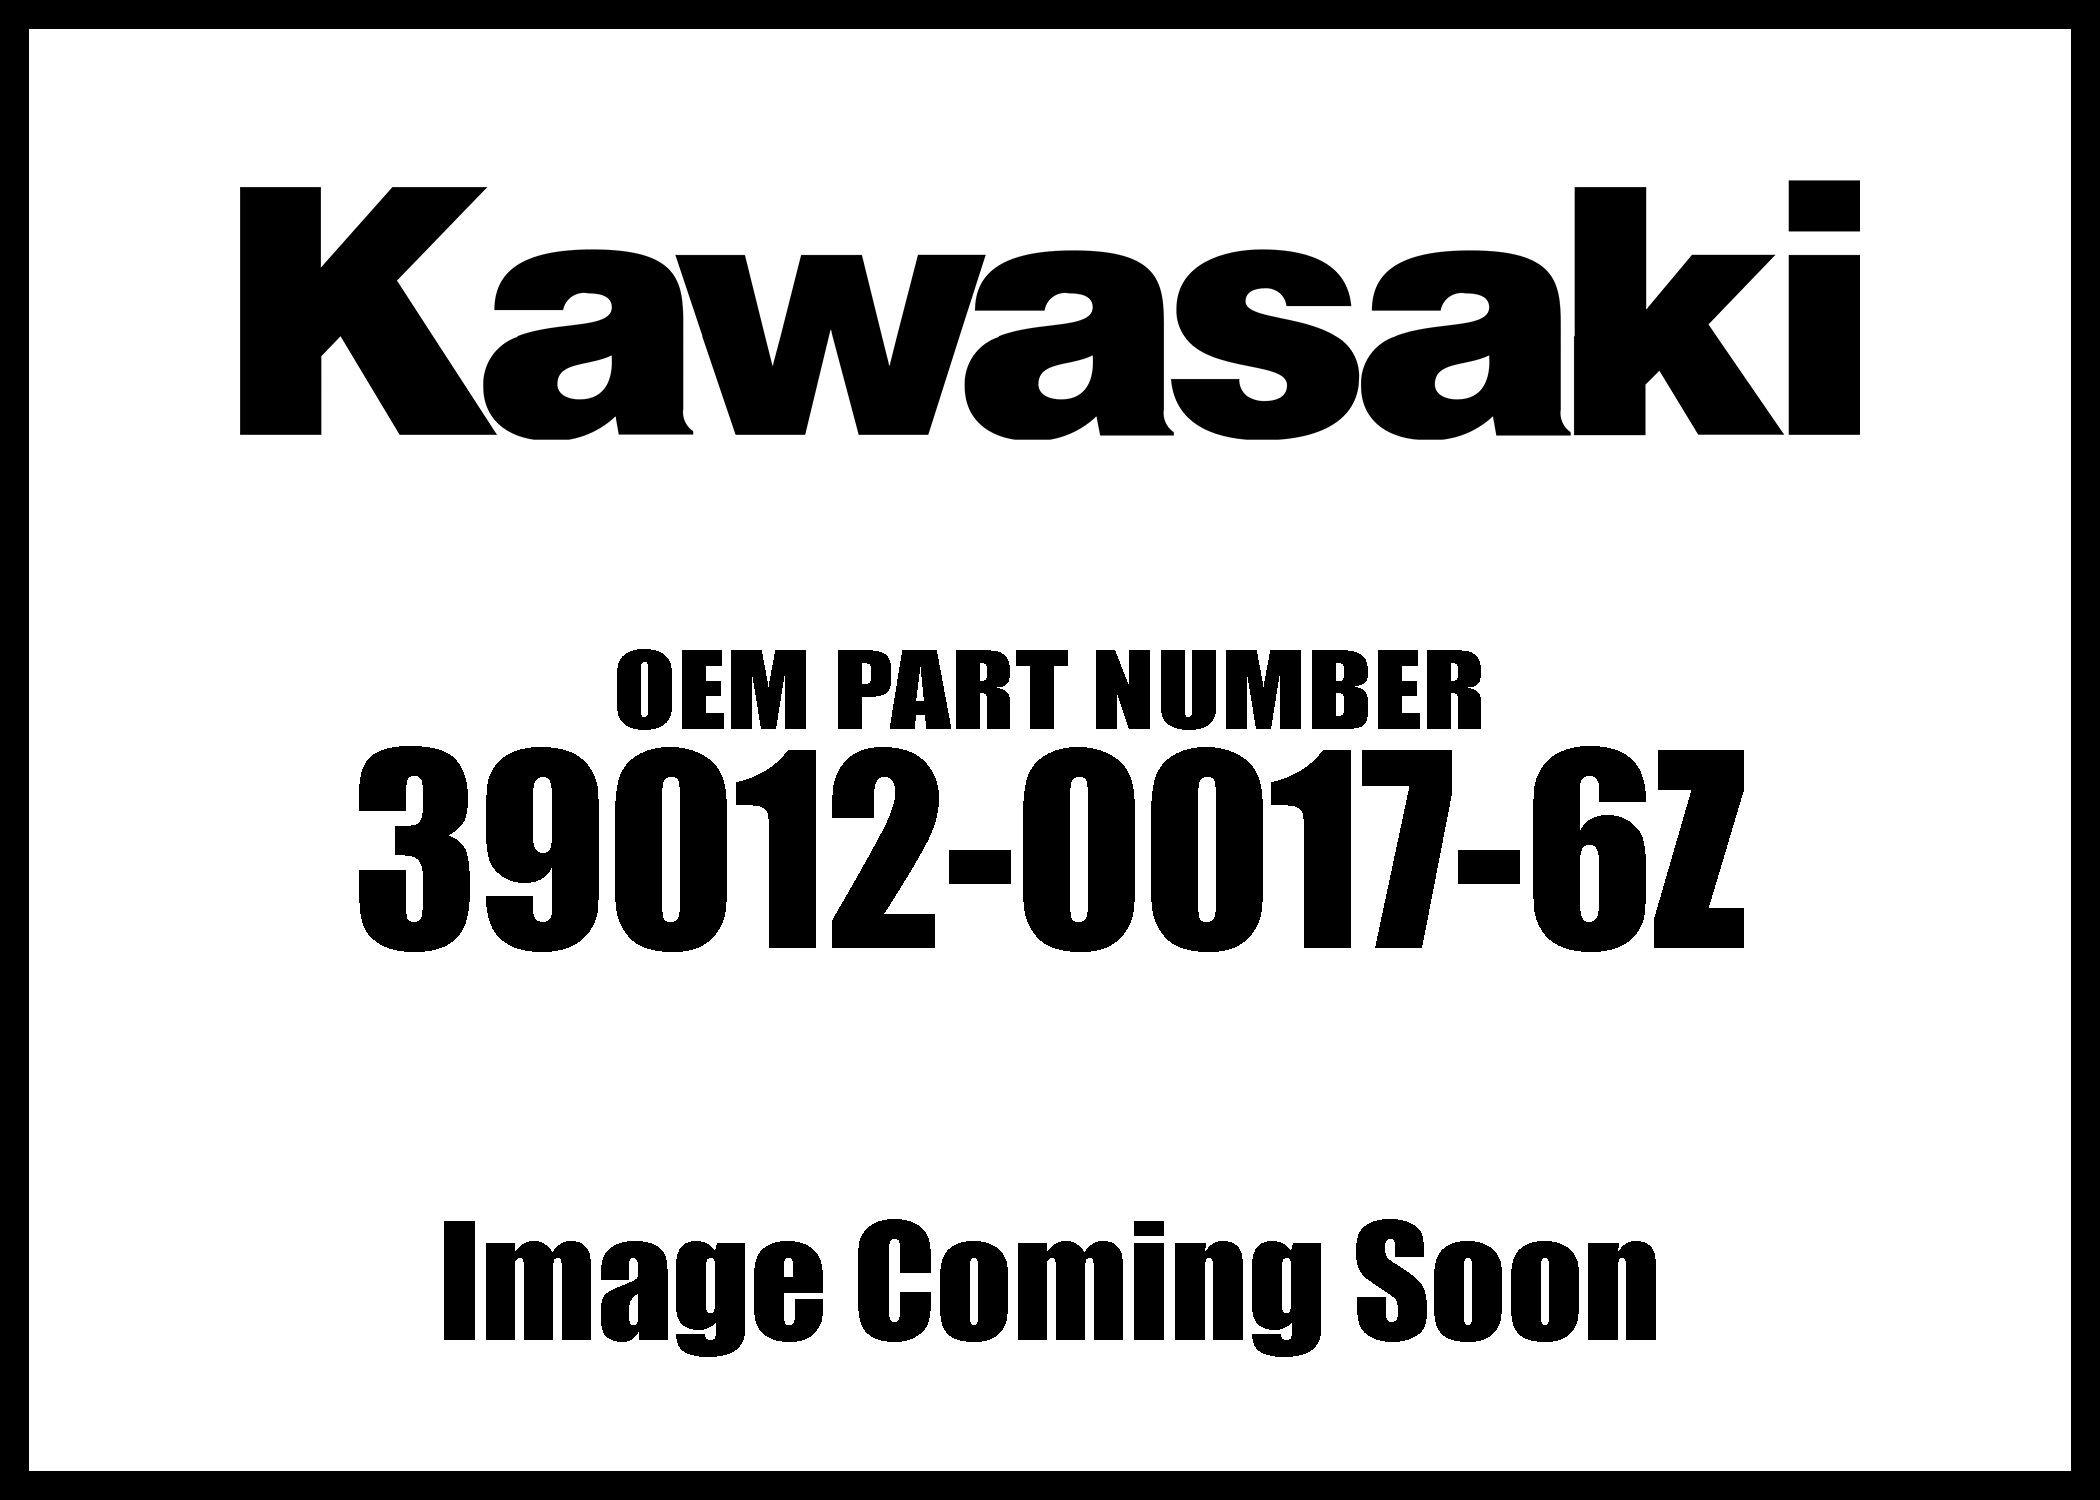 Kawasaki 2008-2013 Teryx 750 4X4 Teryx 750 Fi 4X4 Storage F Black Case 39012-0017-6Z New Oem by Kawasaki